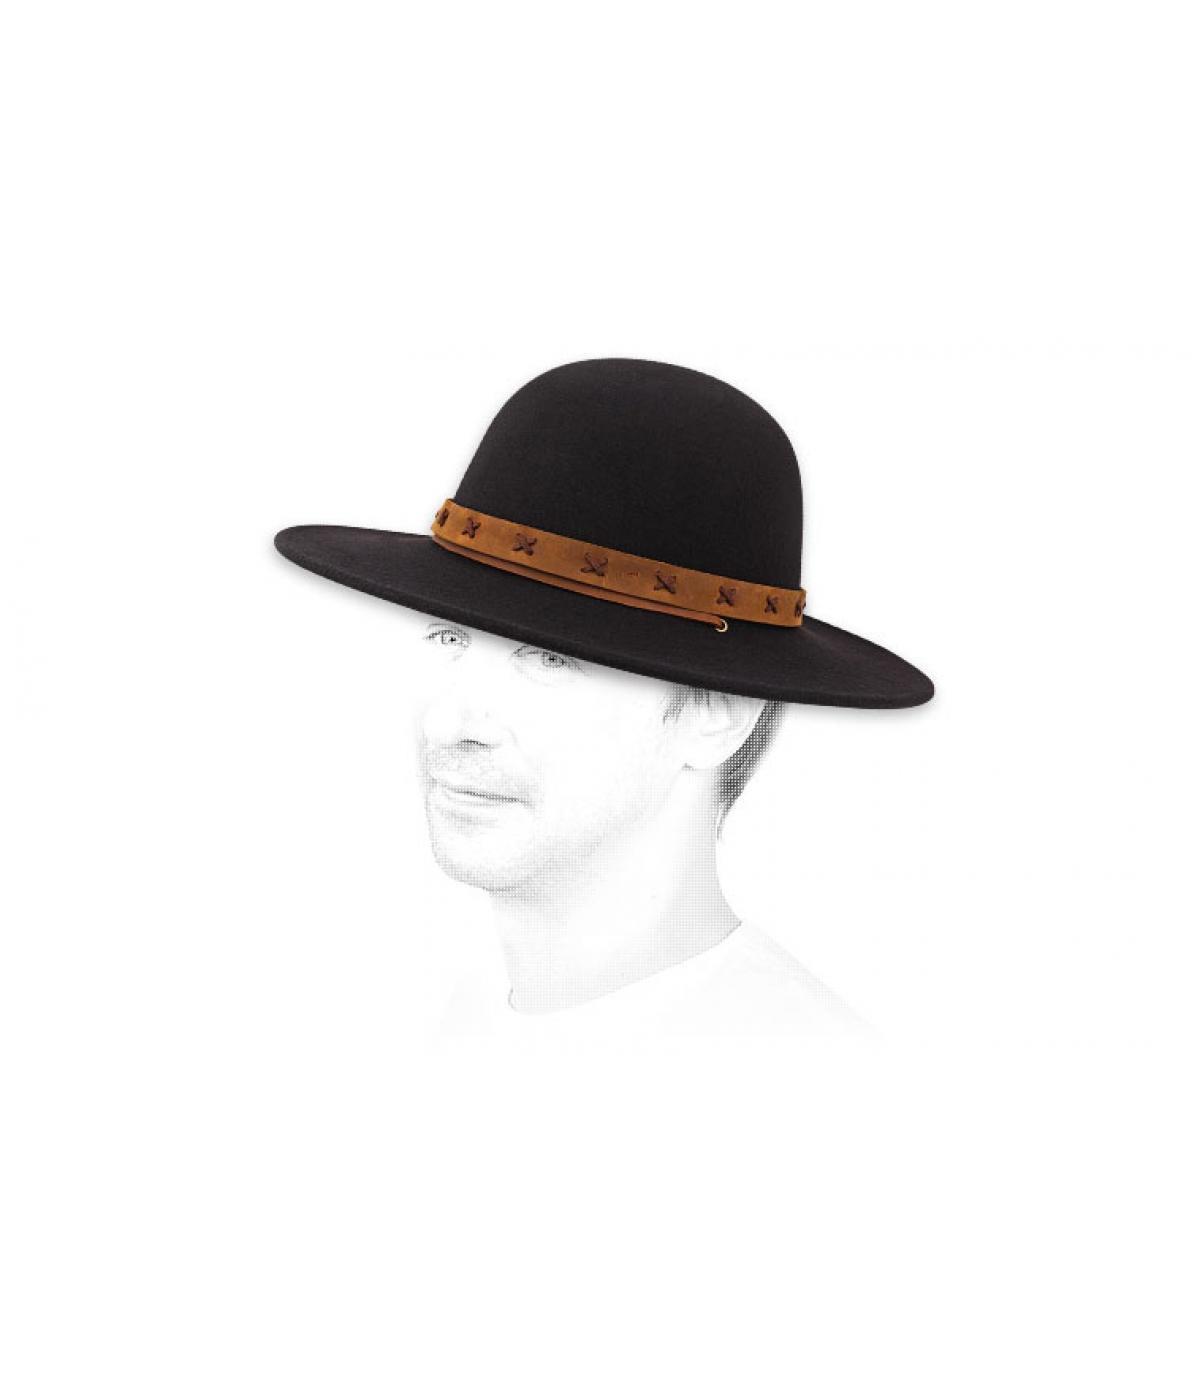 f81d60995a5f21 Brixton men felt hat - Clay hat black tan by Brixton.